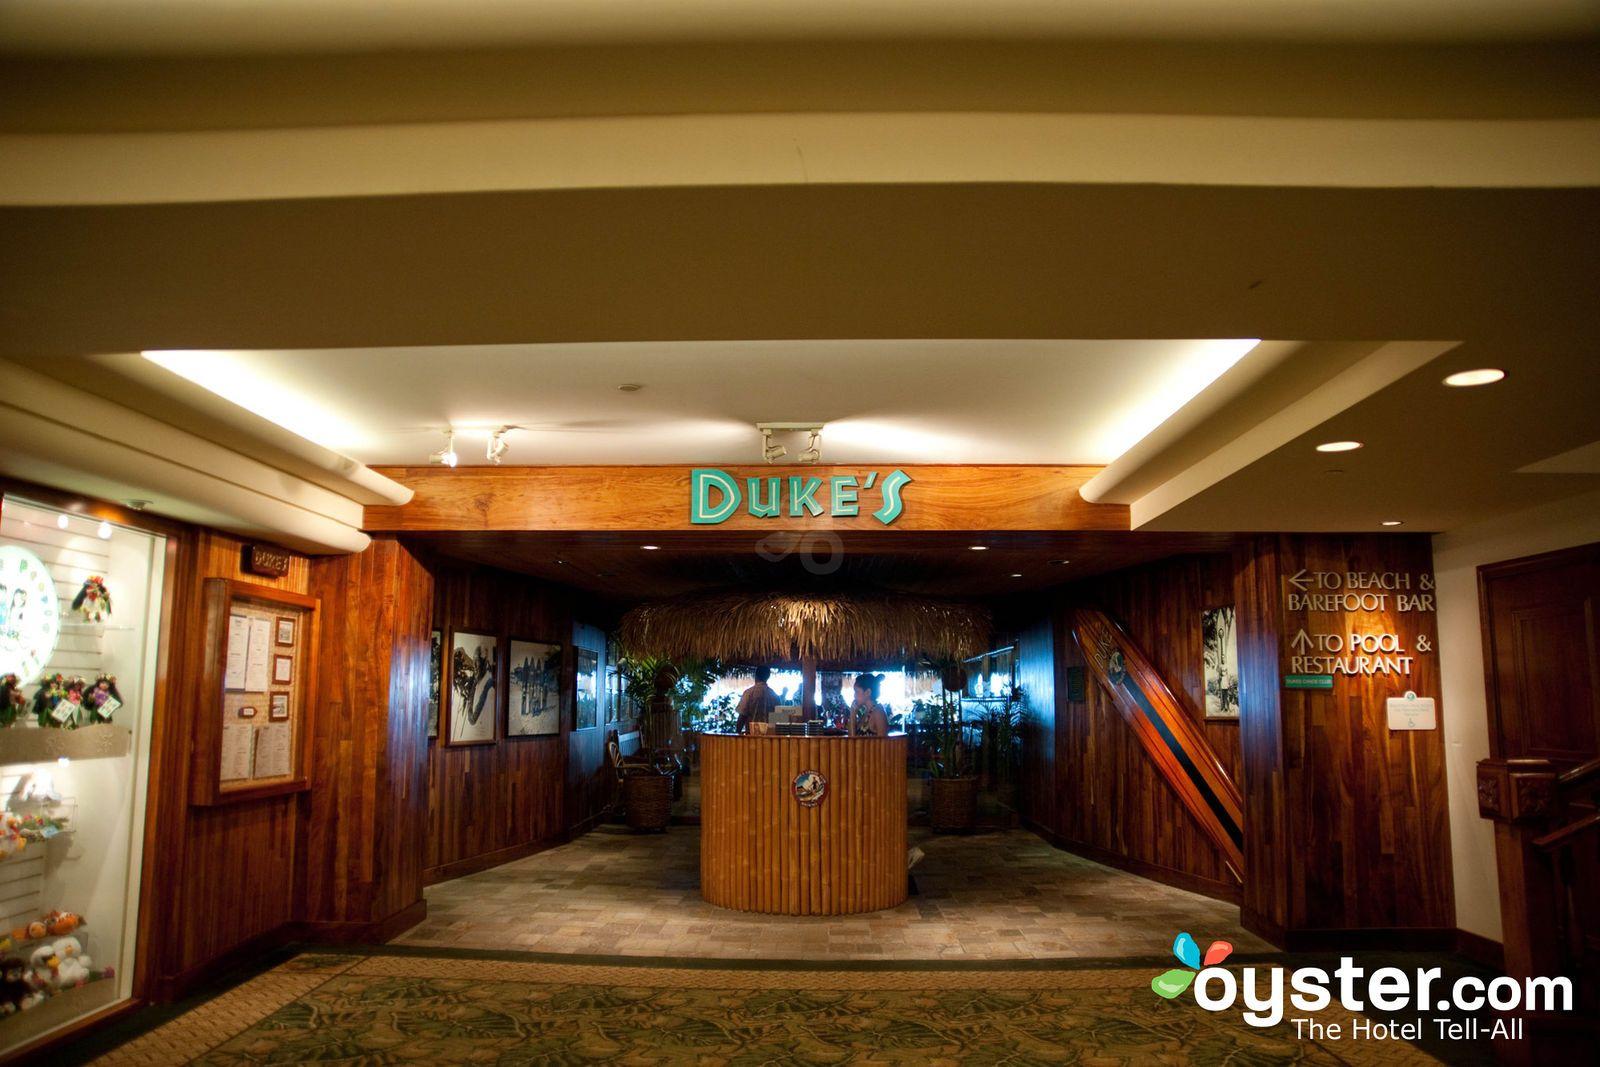 Duke S Canoe Club At The Outrigger Waikiki On The Beach